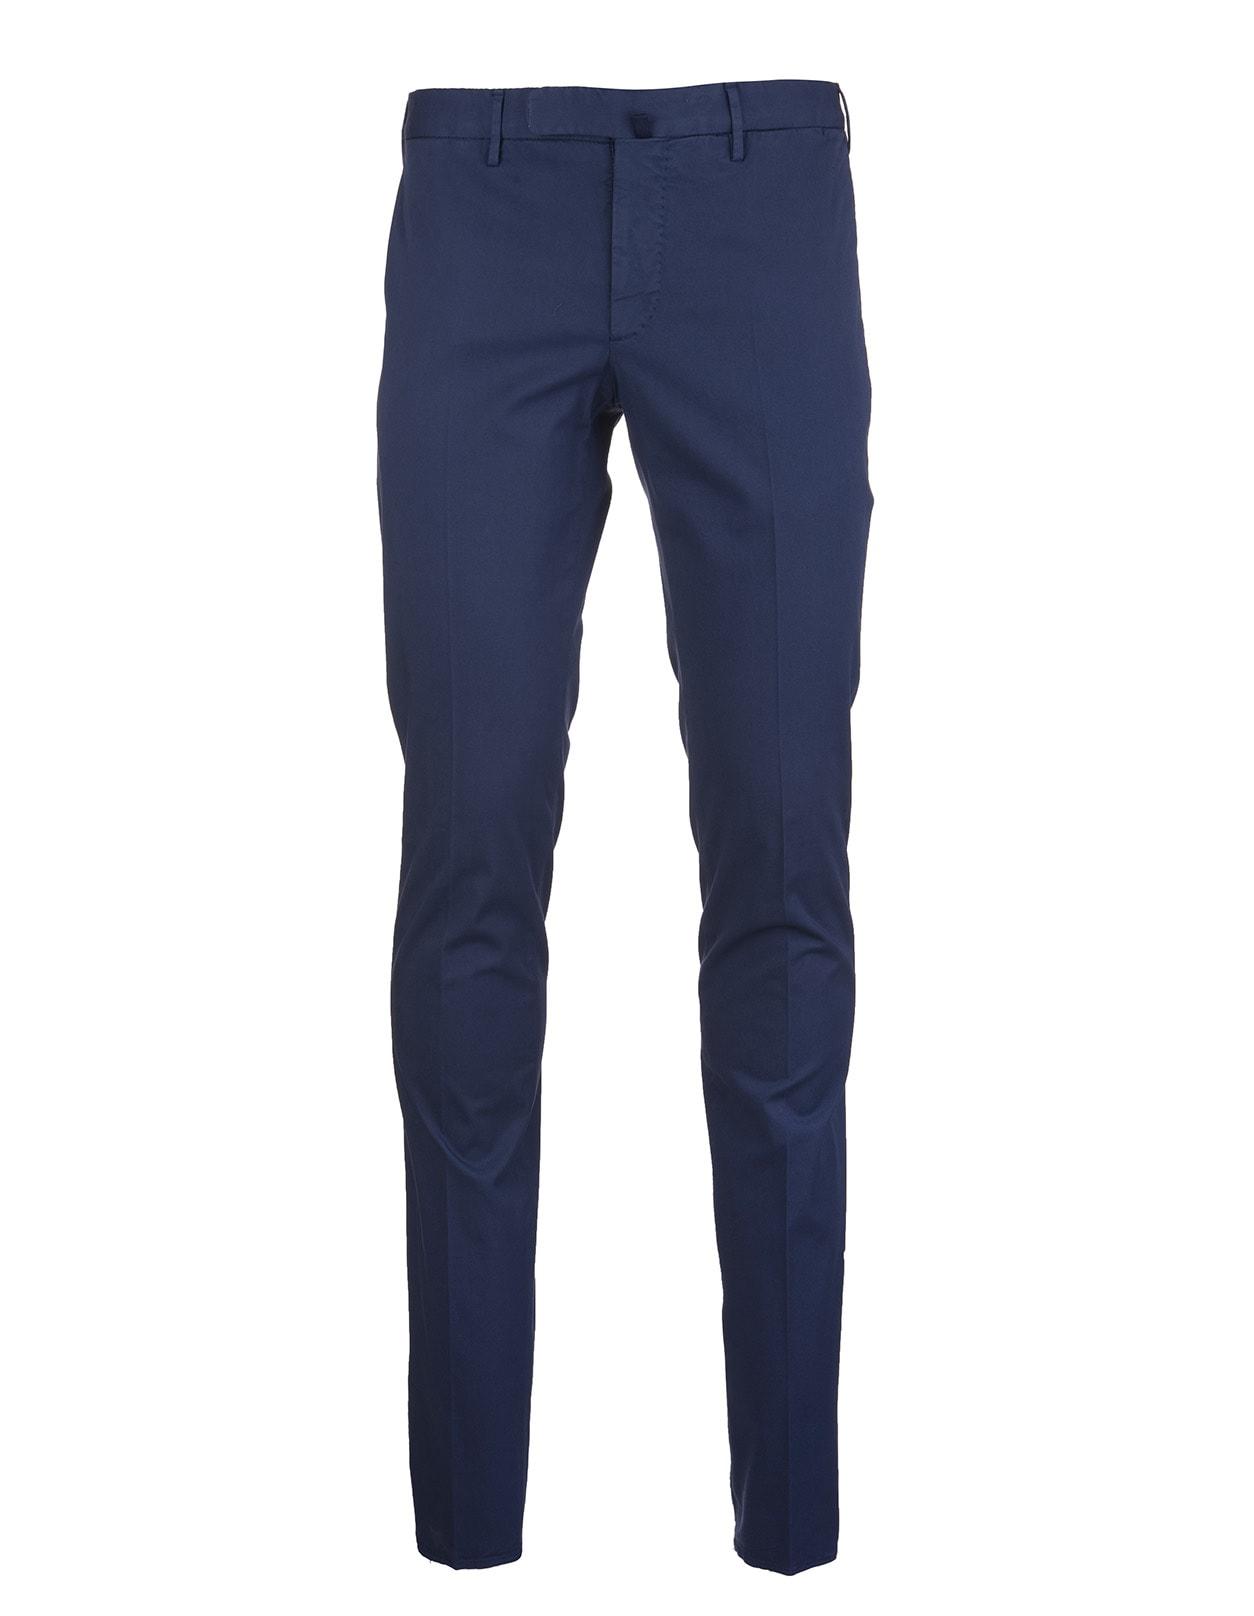 Blue Venezia 1951 Pants In Royal Batavia Cotton